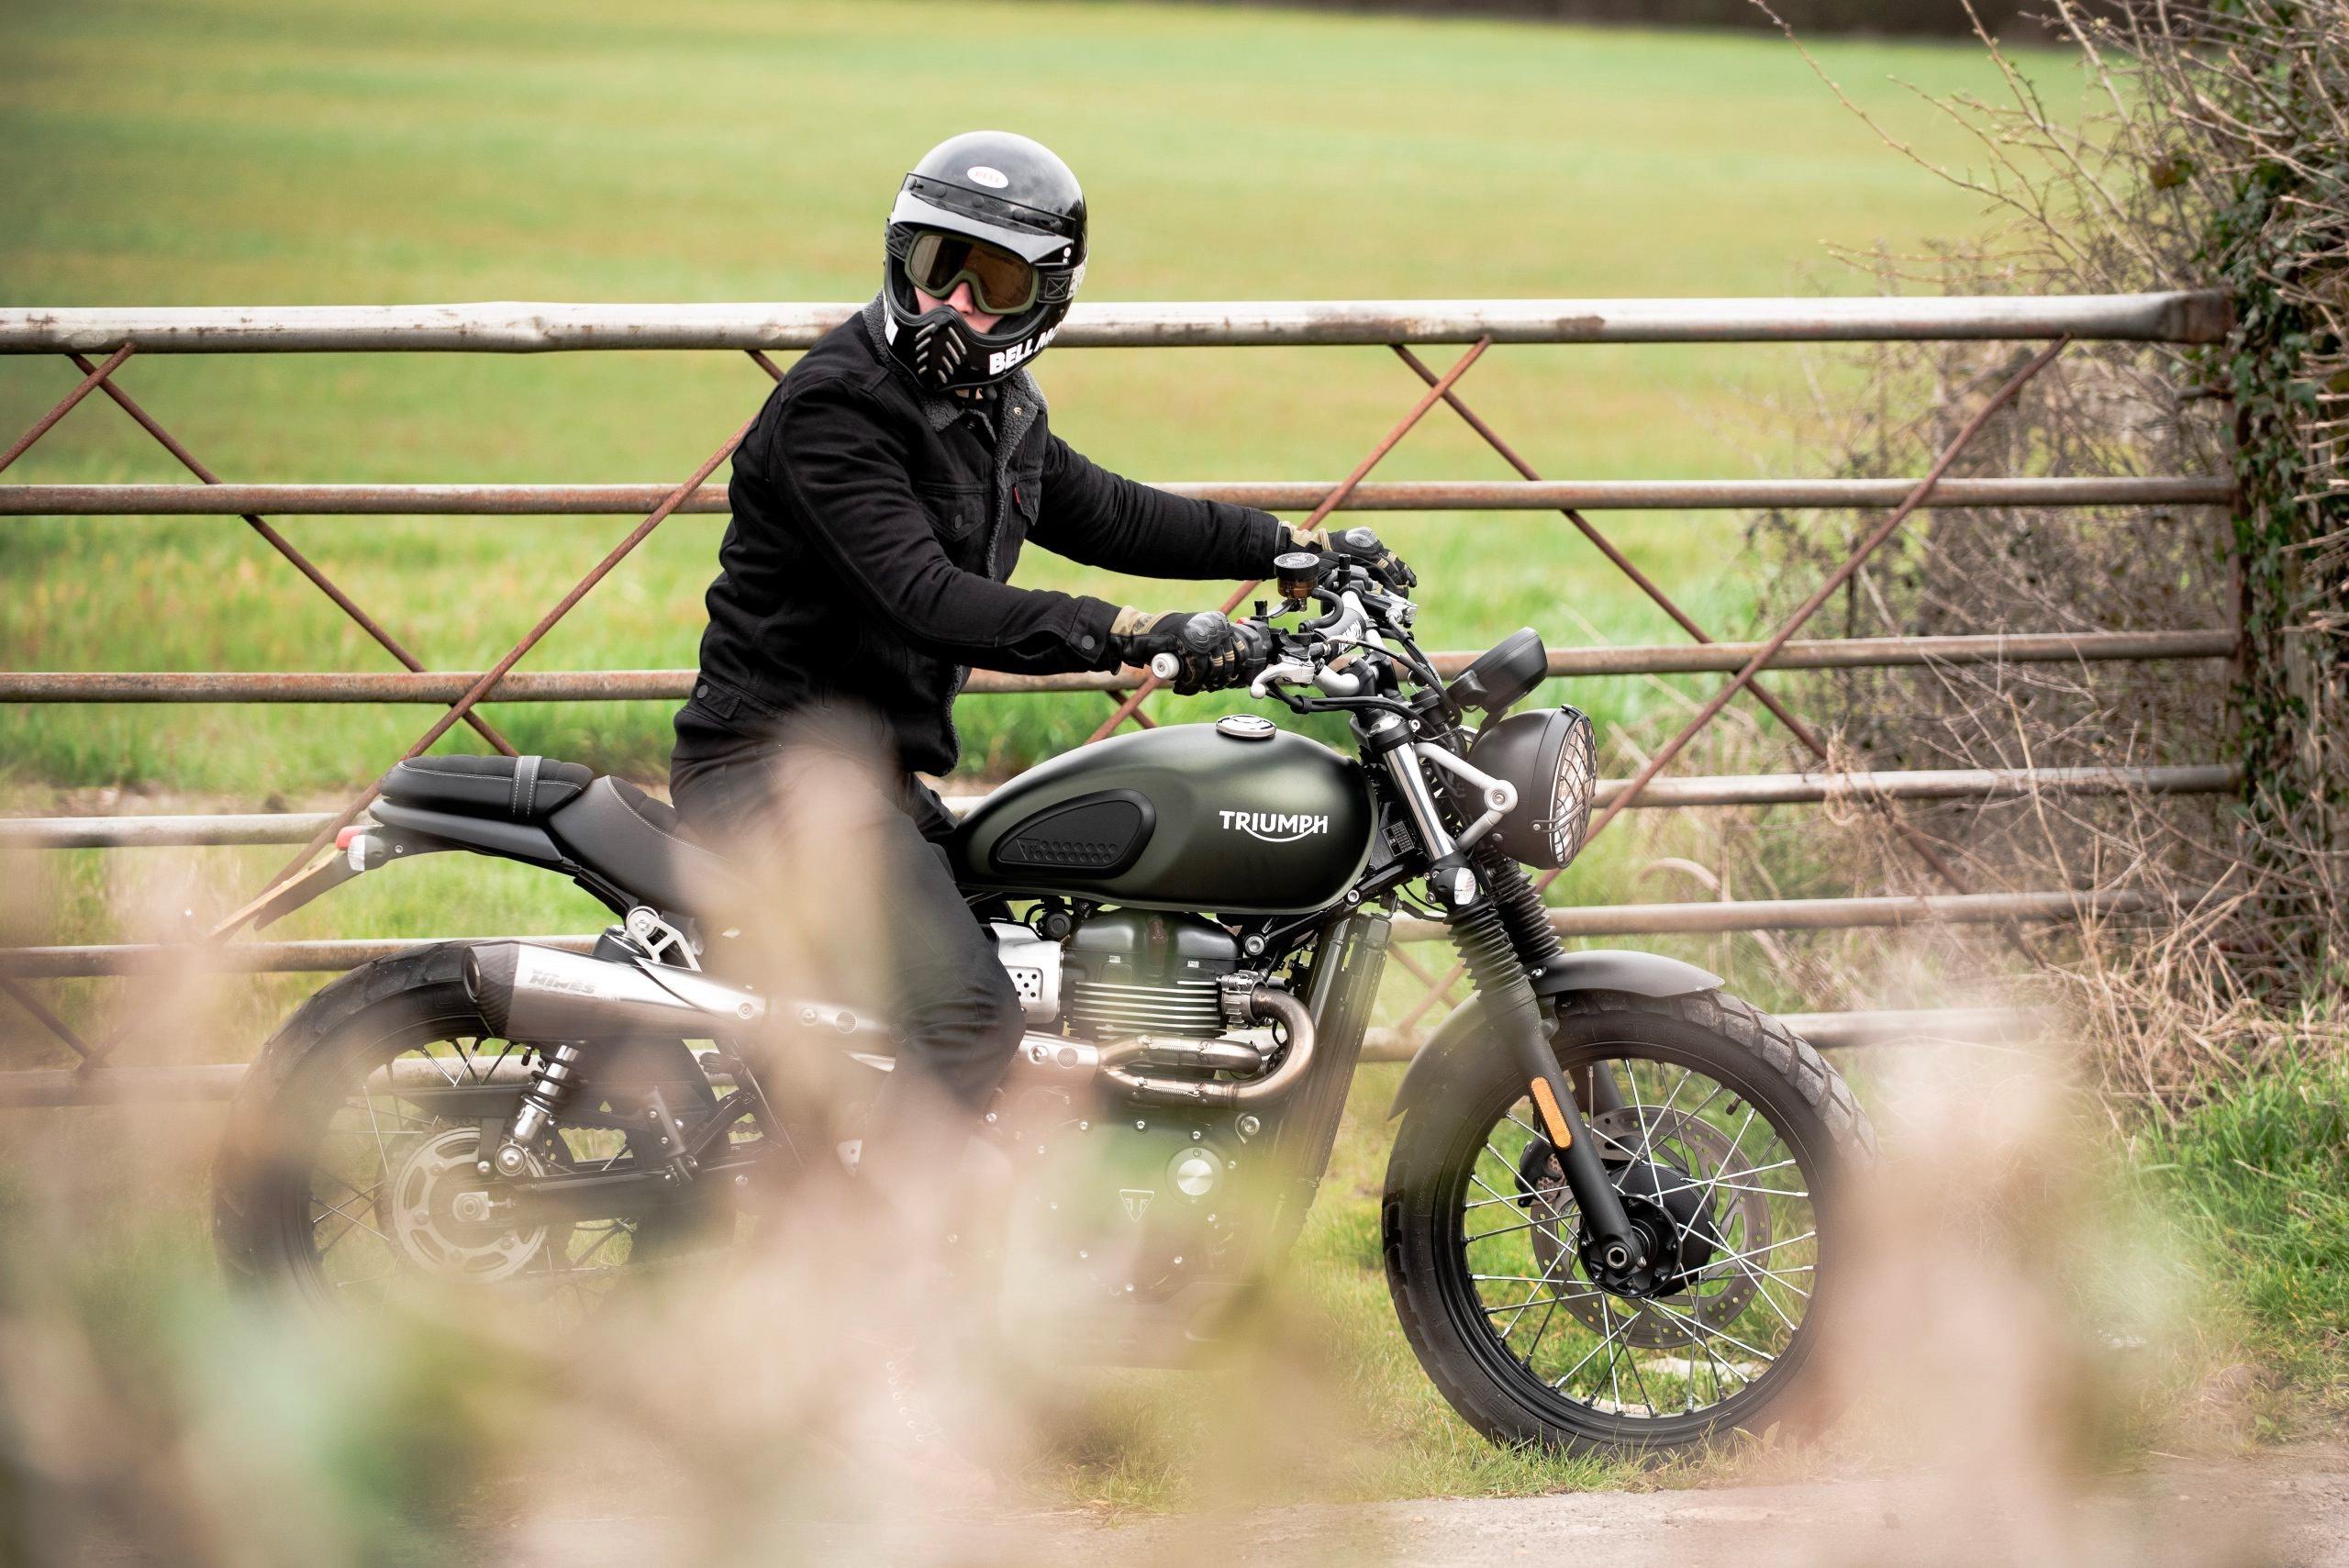 Motorcycle Training School Insurance Atb Insurance Devitt